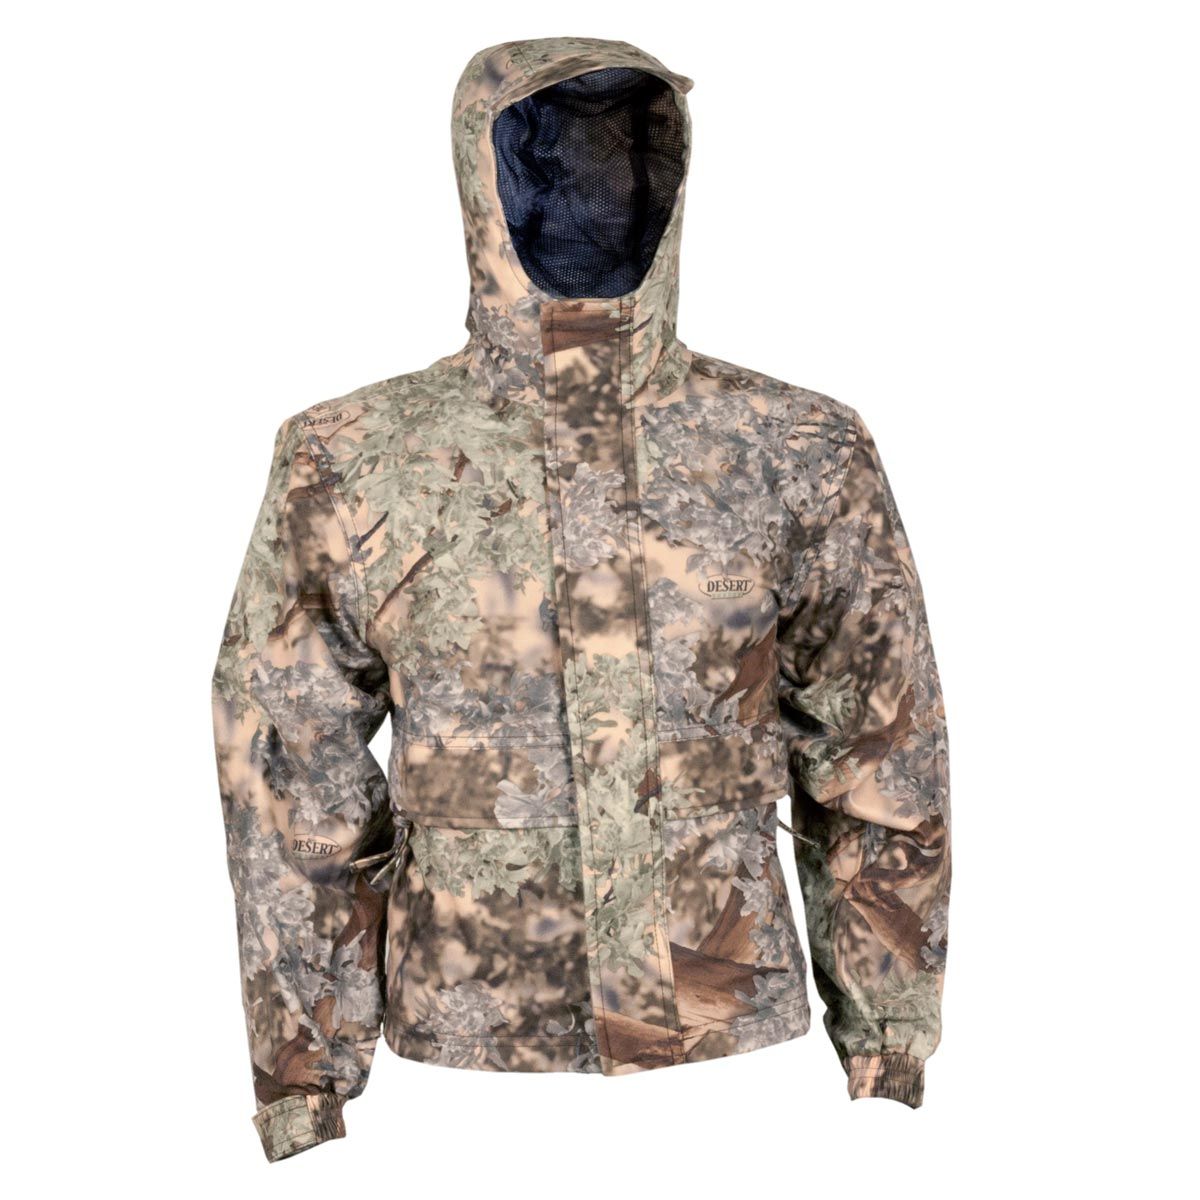 Kids Camo Waterproof Rain Jacket